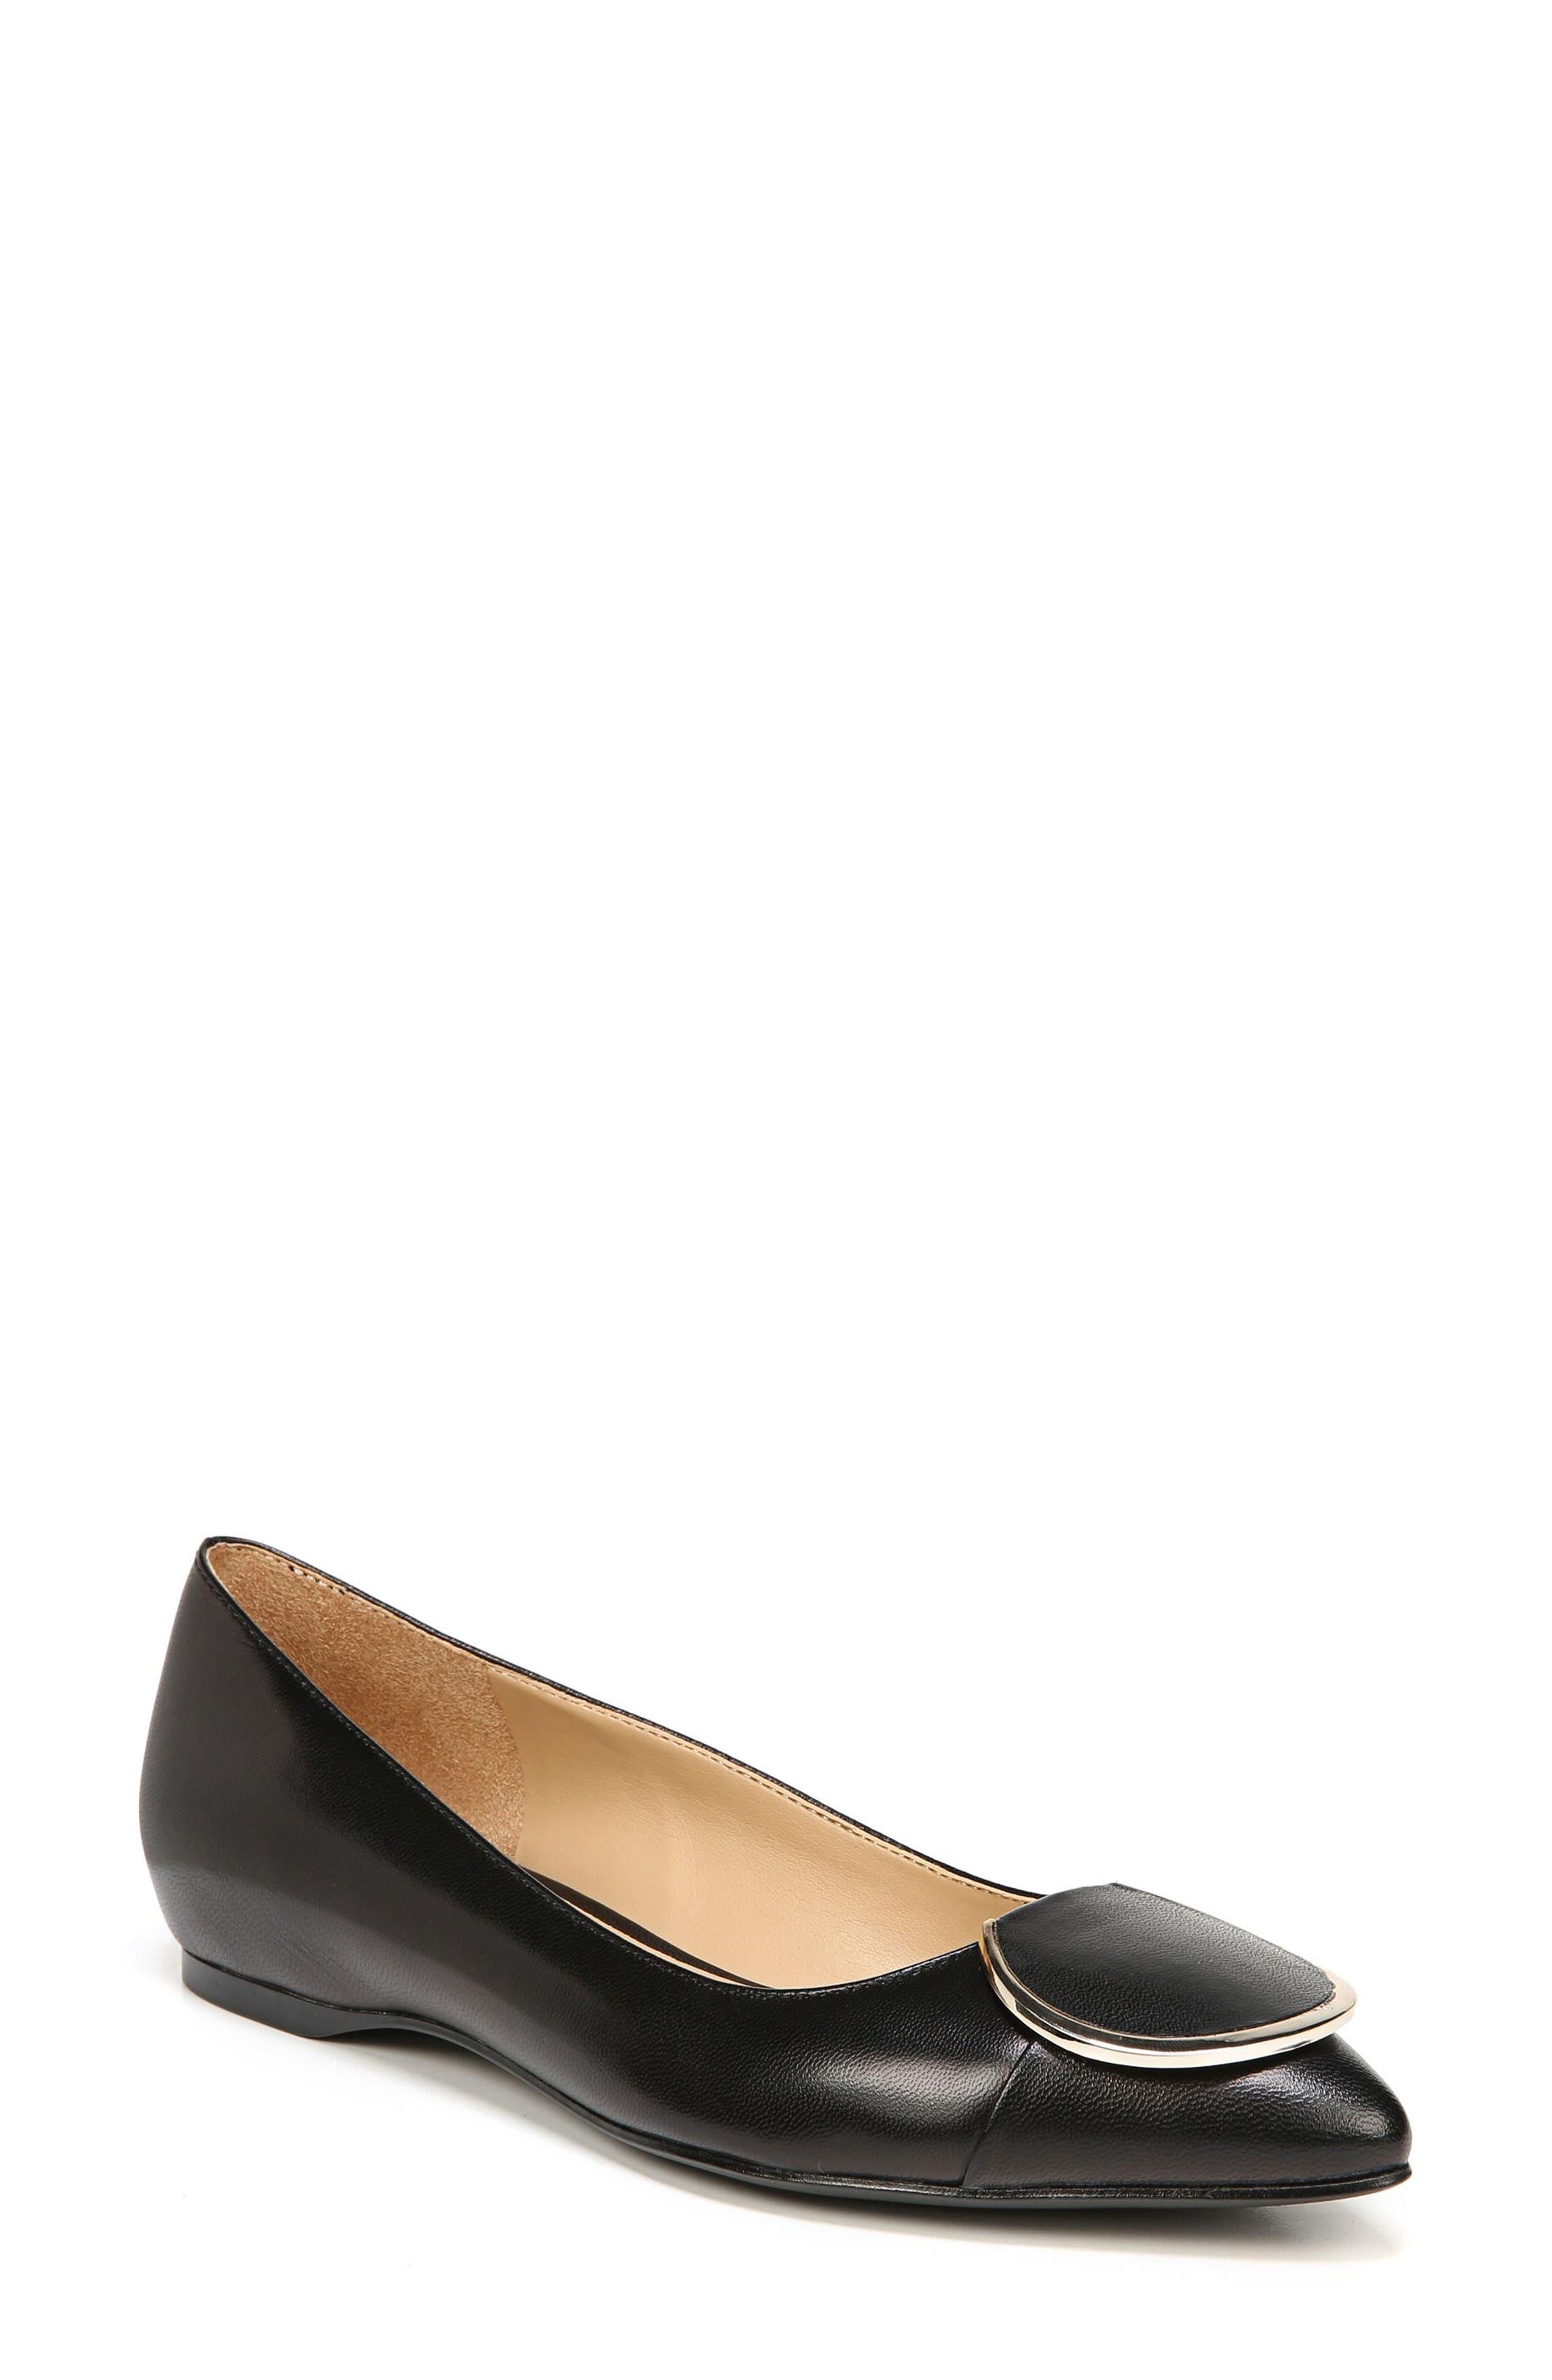 Stella Flat,                         Main,                         color, Black Leather